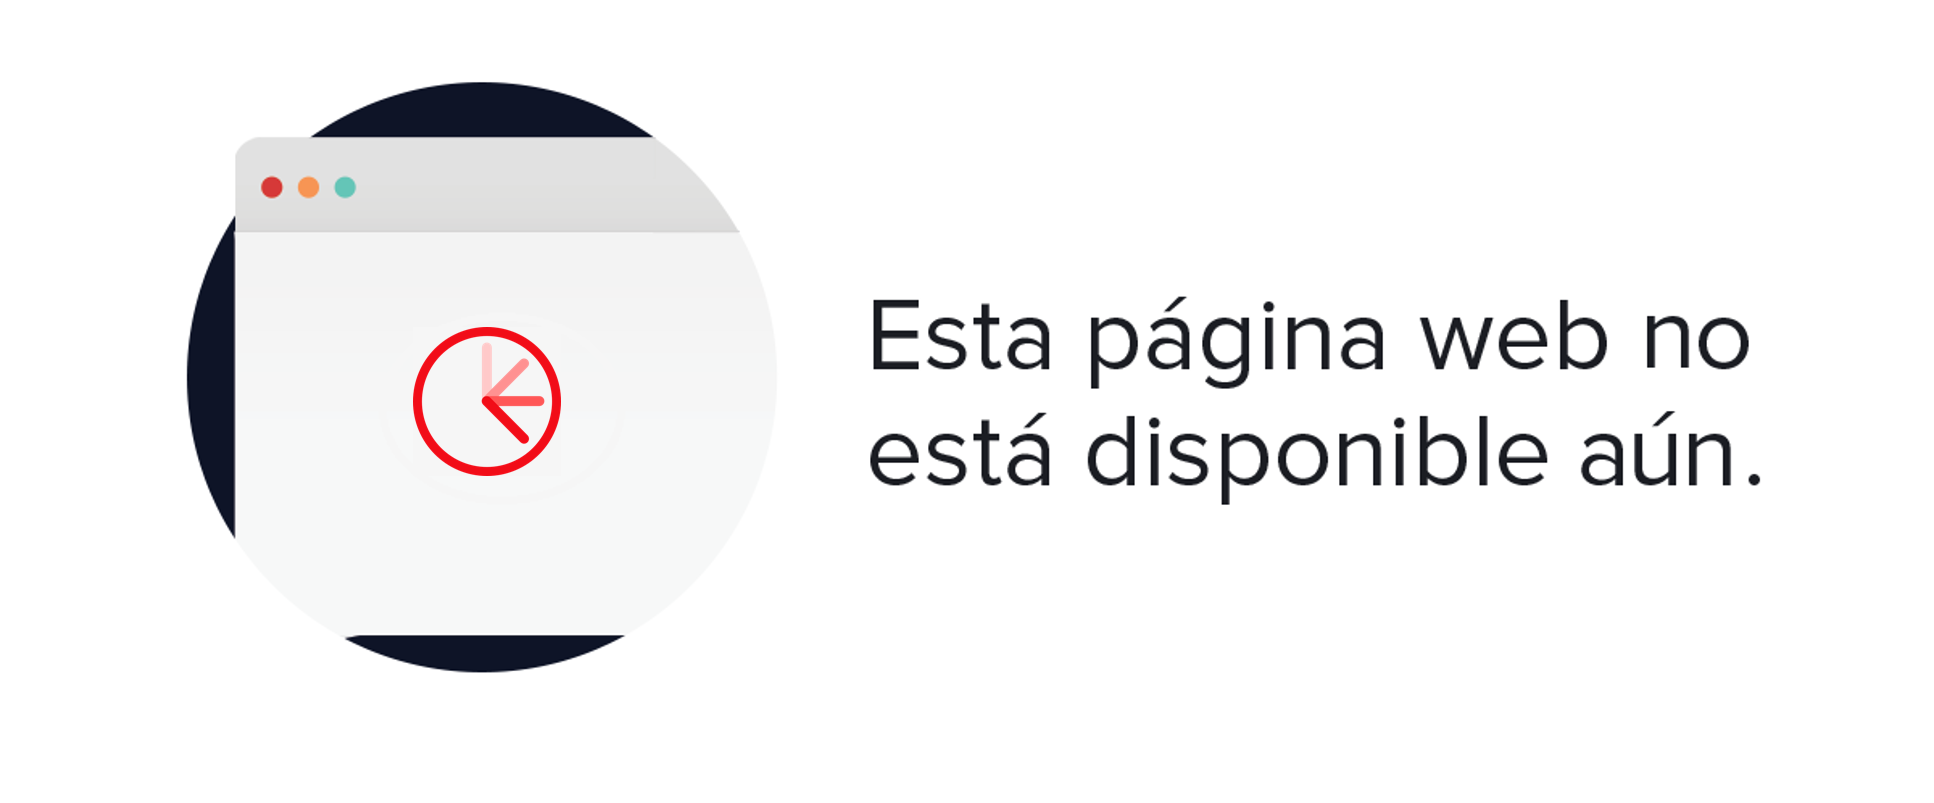 Hogan Negro Zapatillas Deportivas Hombre 467762 - Barato - MJQWJQO